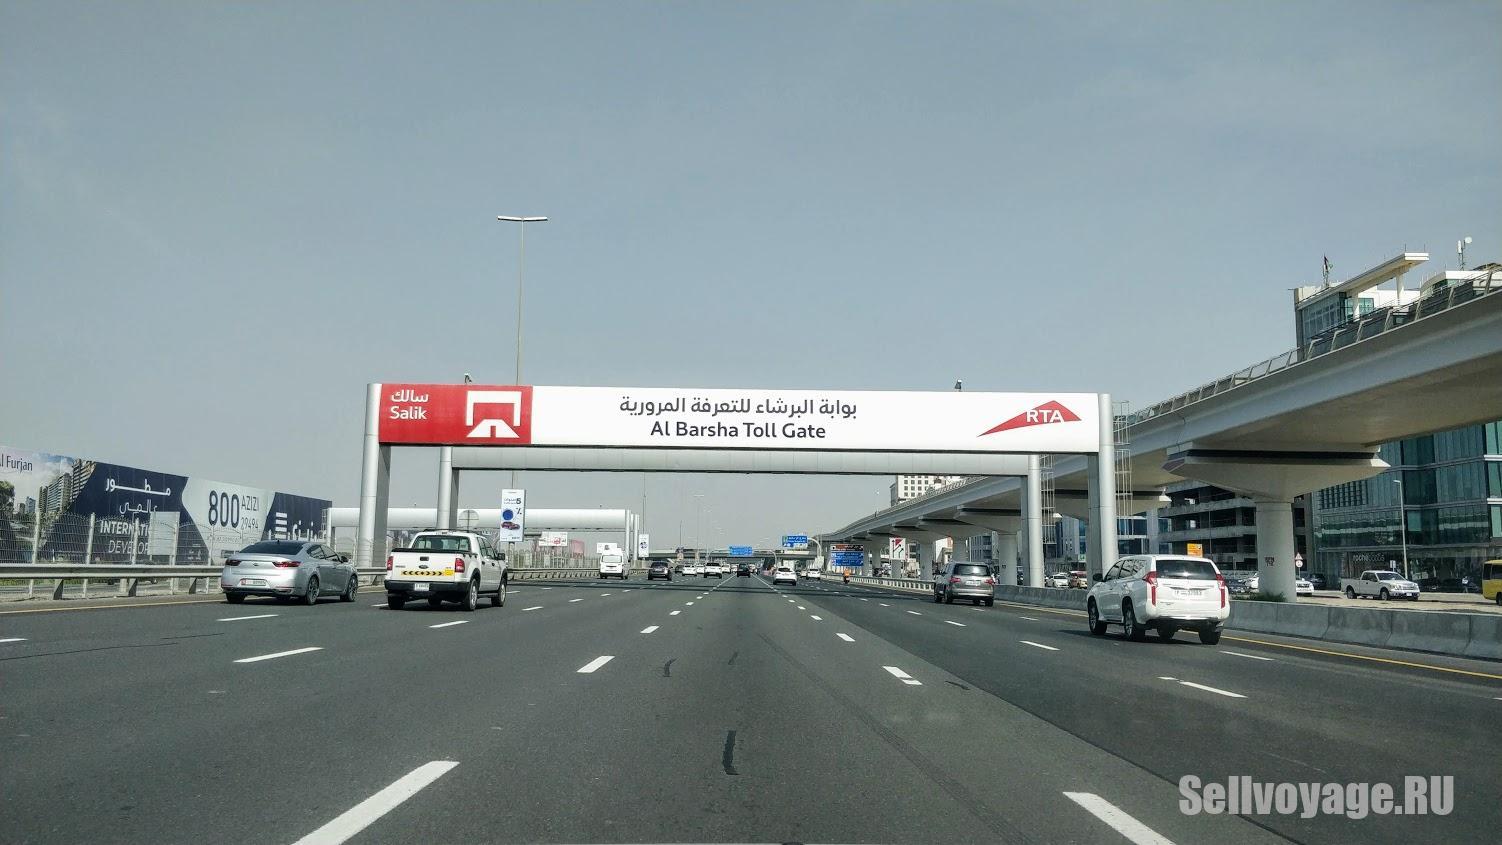 Рамка оплаты за платную дорогу в Дубае - САЛИК